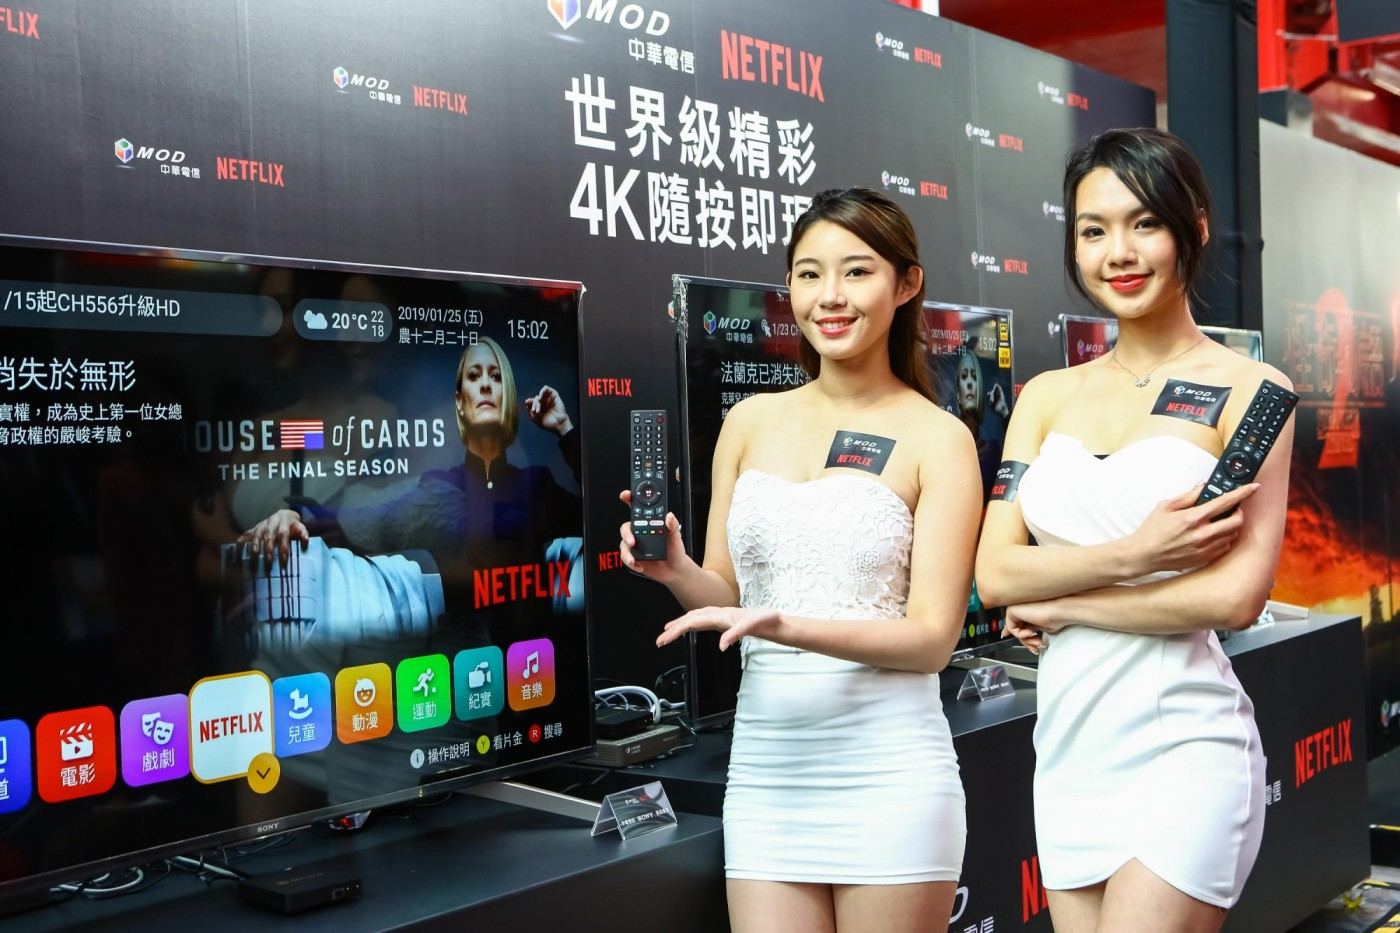 Netflix正式進駐MOD,台灣內容產業帶來2大動能